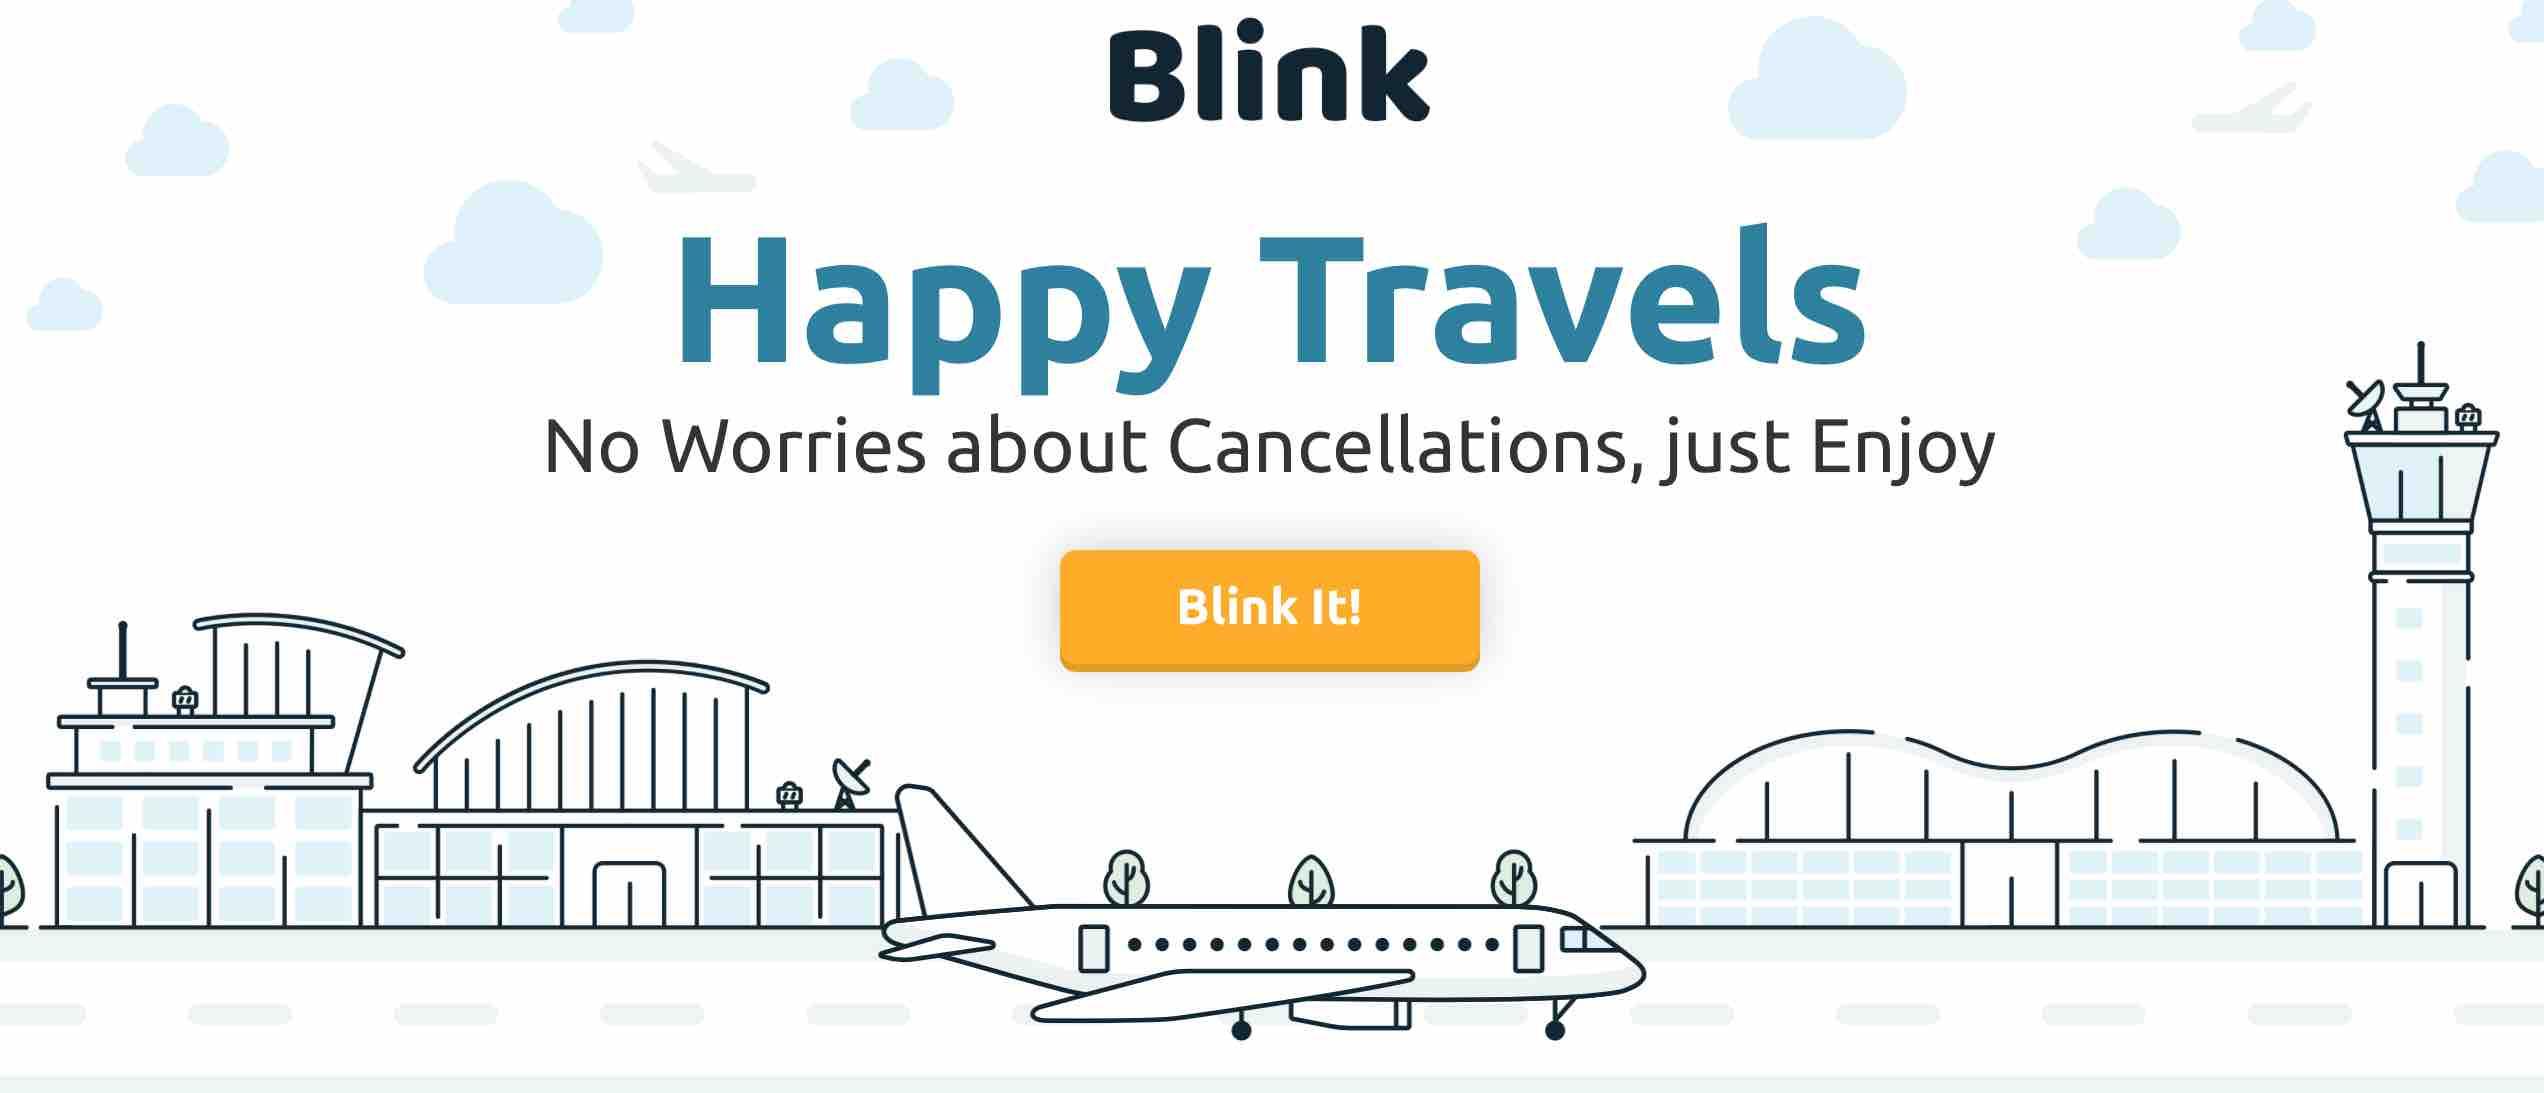 insurtech Blink digitalis biztositas